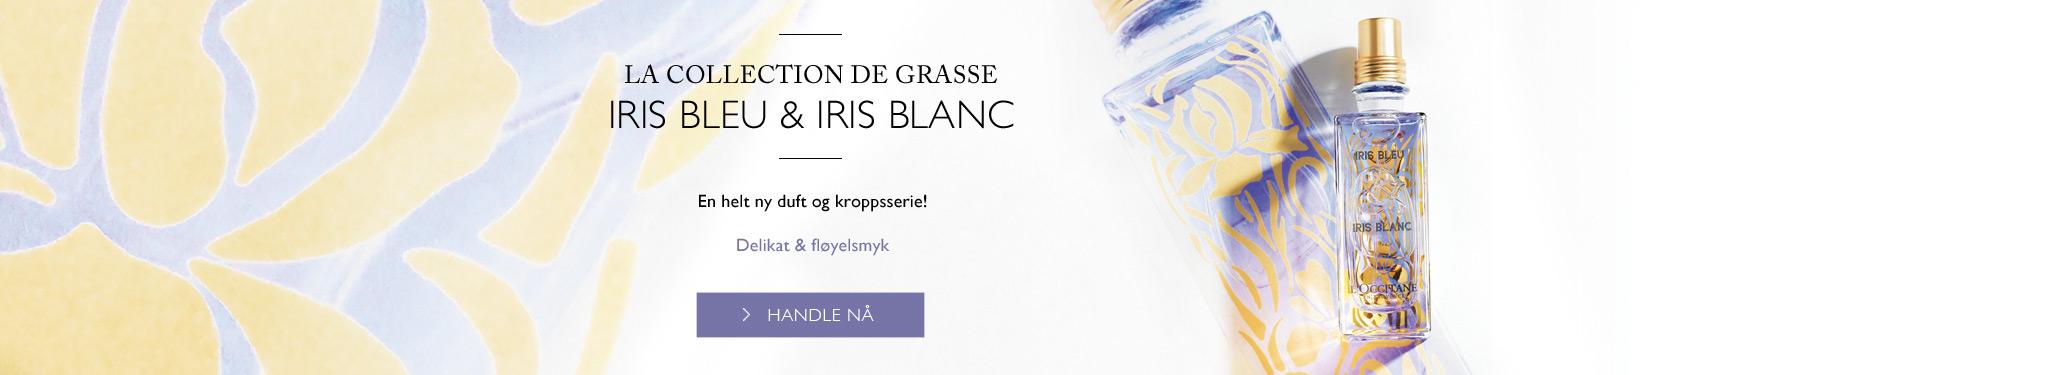 The new La Collection de Grasse fragrance